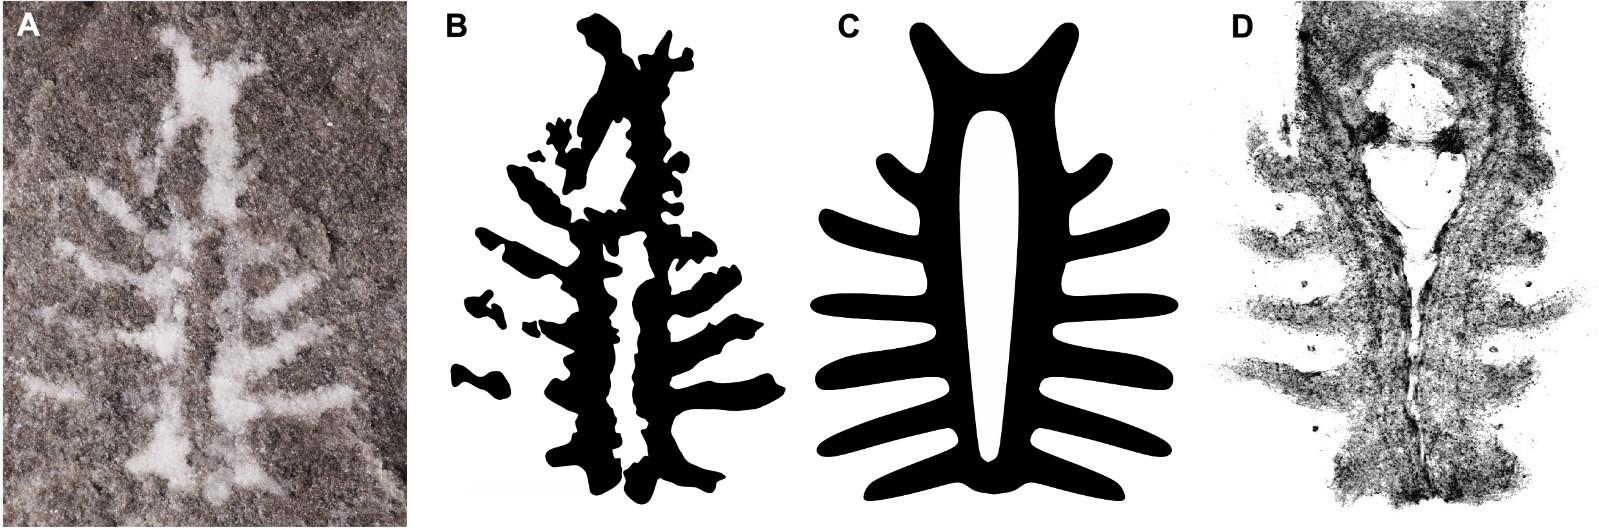 310-Million Year Old Fossil Sheds Light on Horseshoe Crab Brains